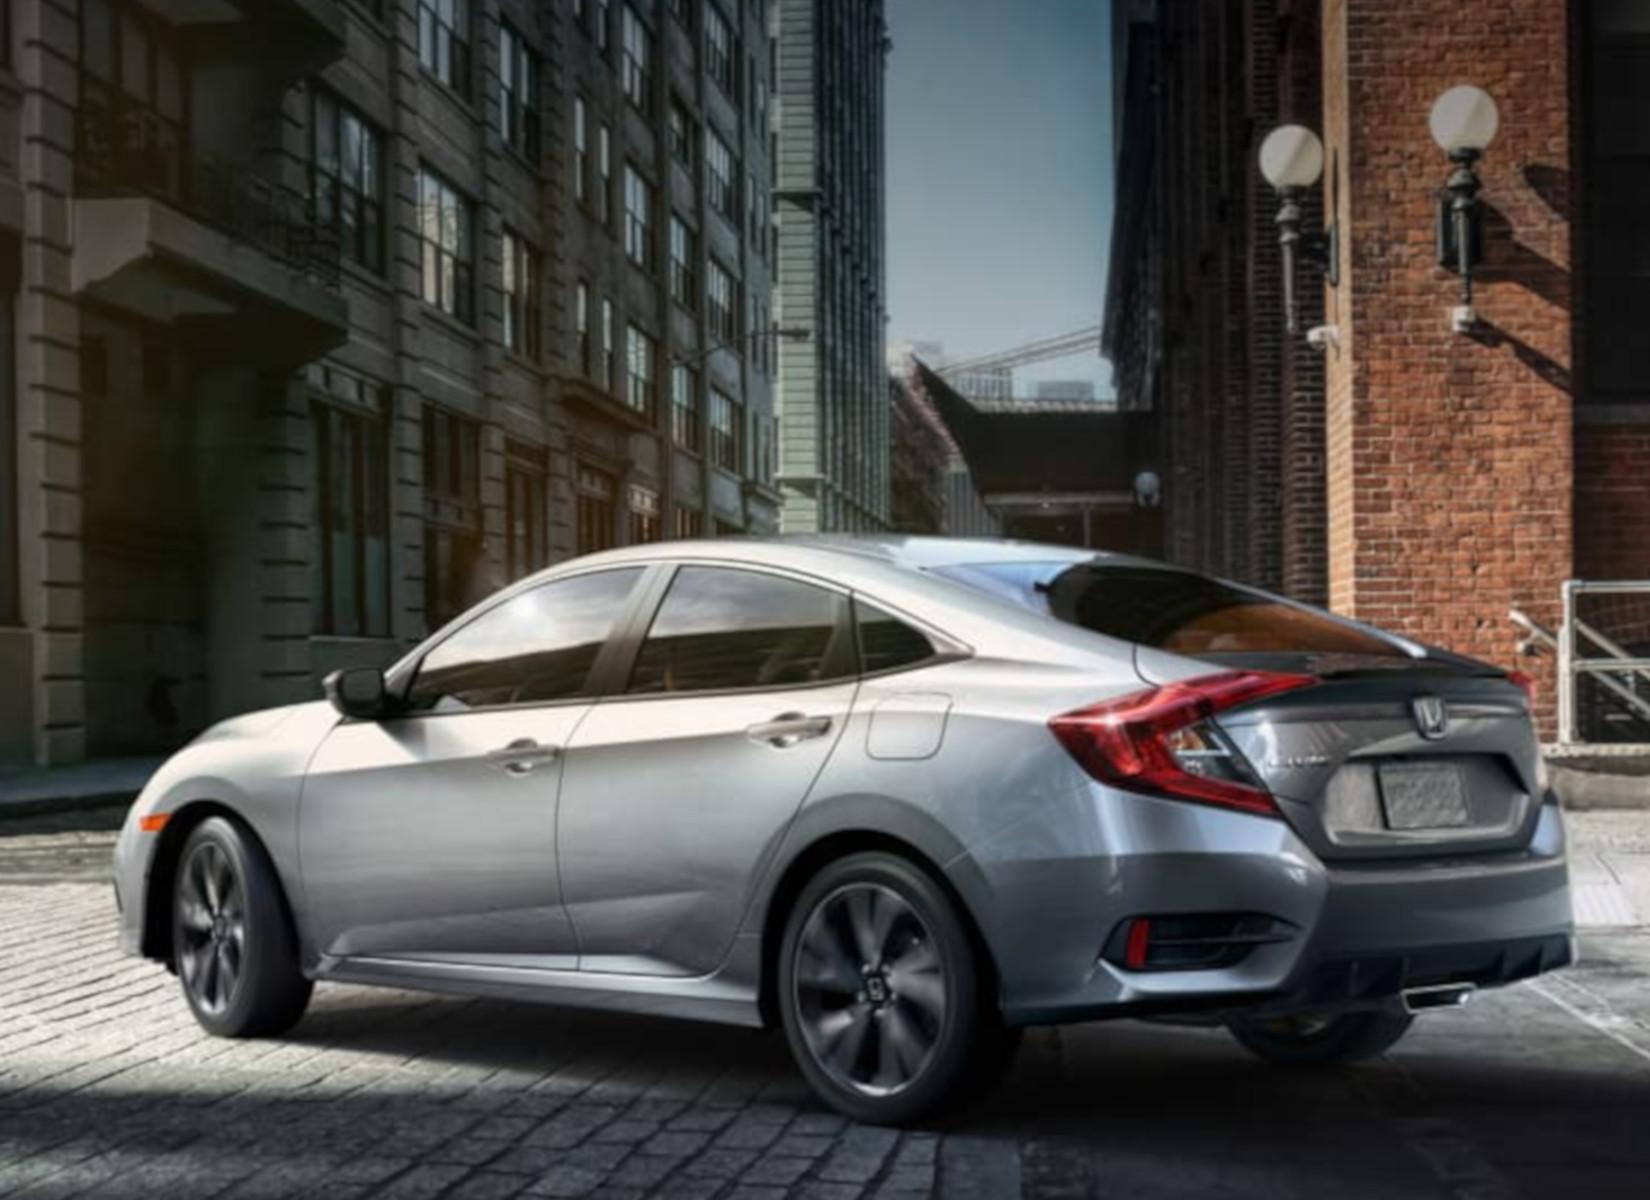 The high-performance 2019 Honda Civic